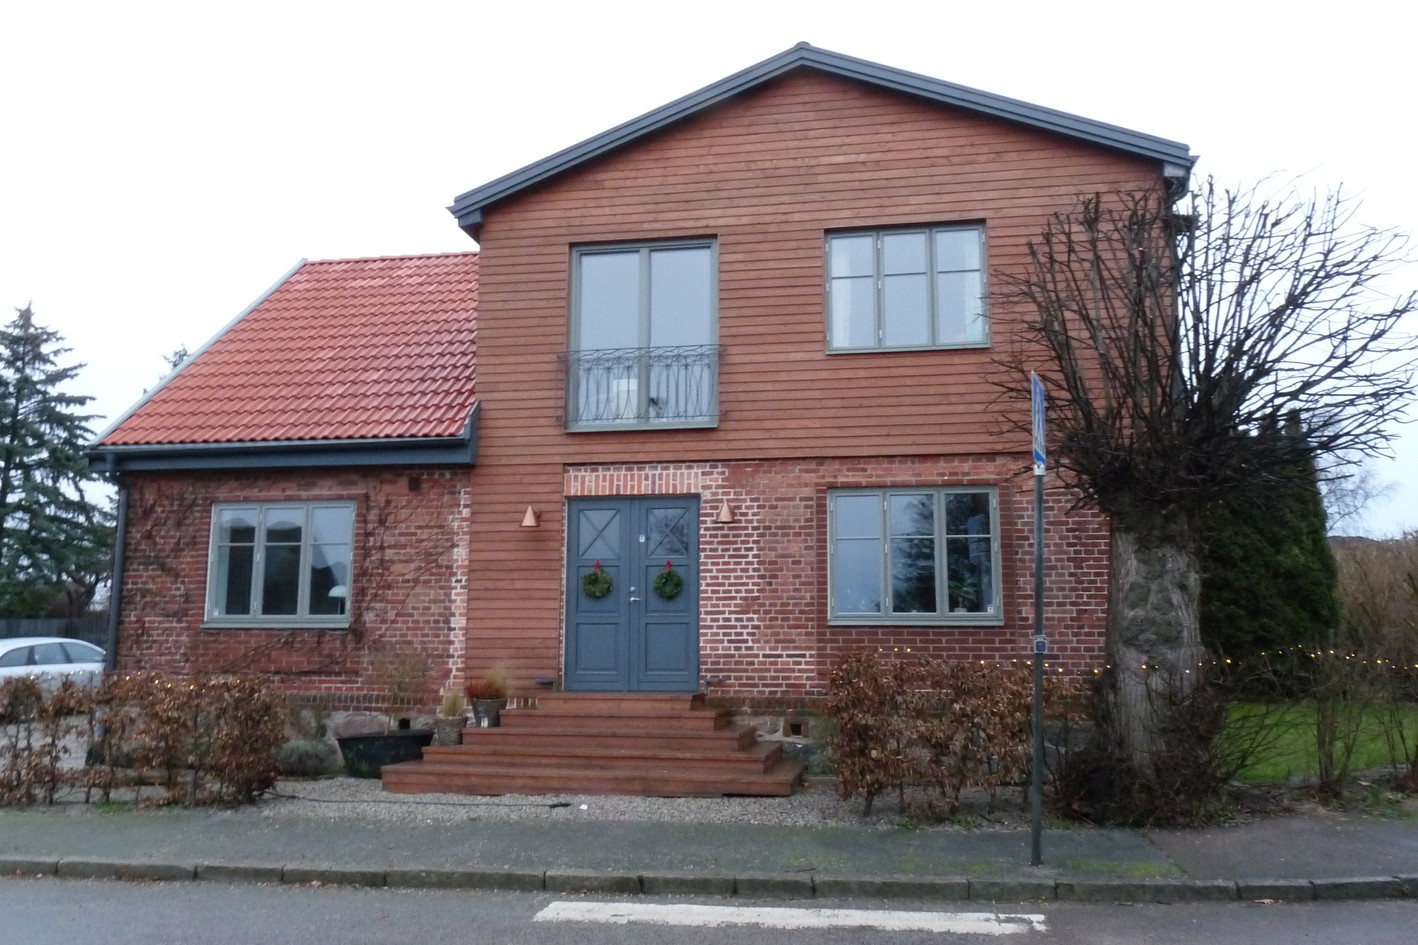 Billeberga-Bostadsombyggnad-Entréfasad - 2018